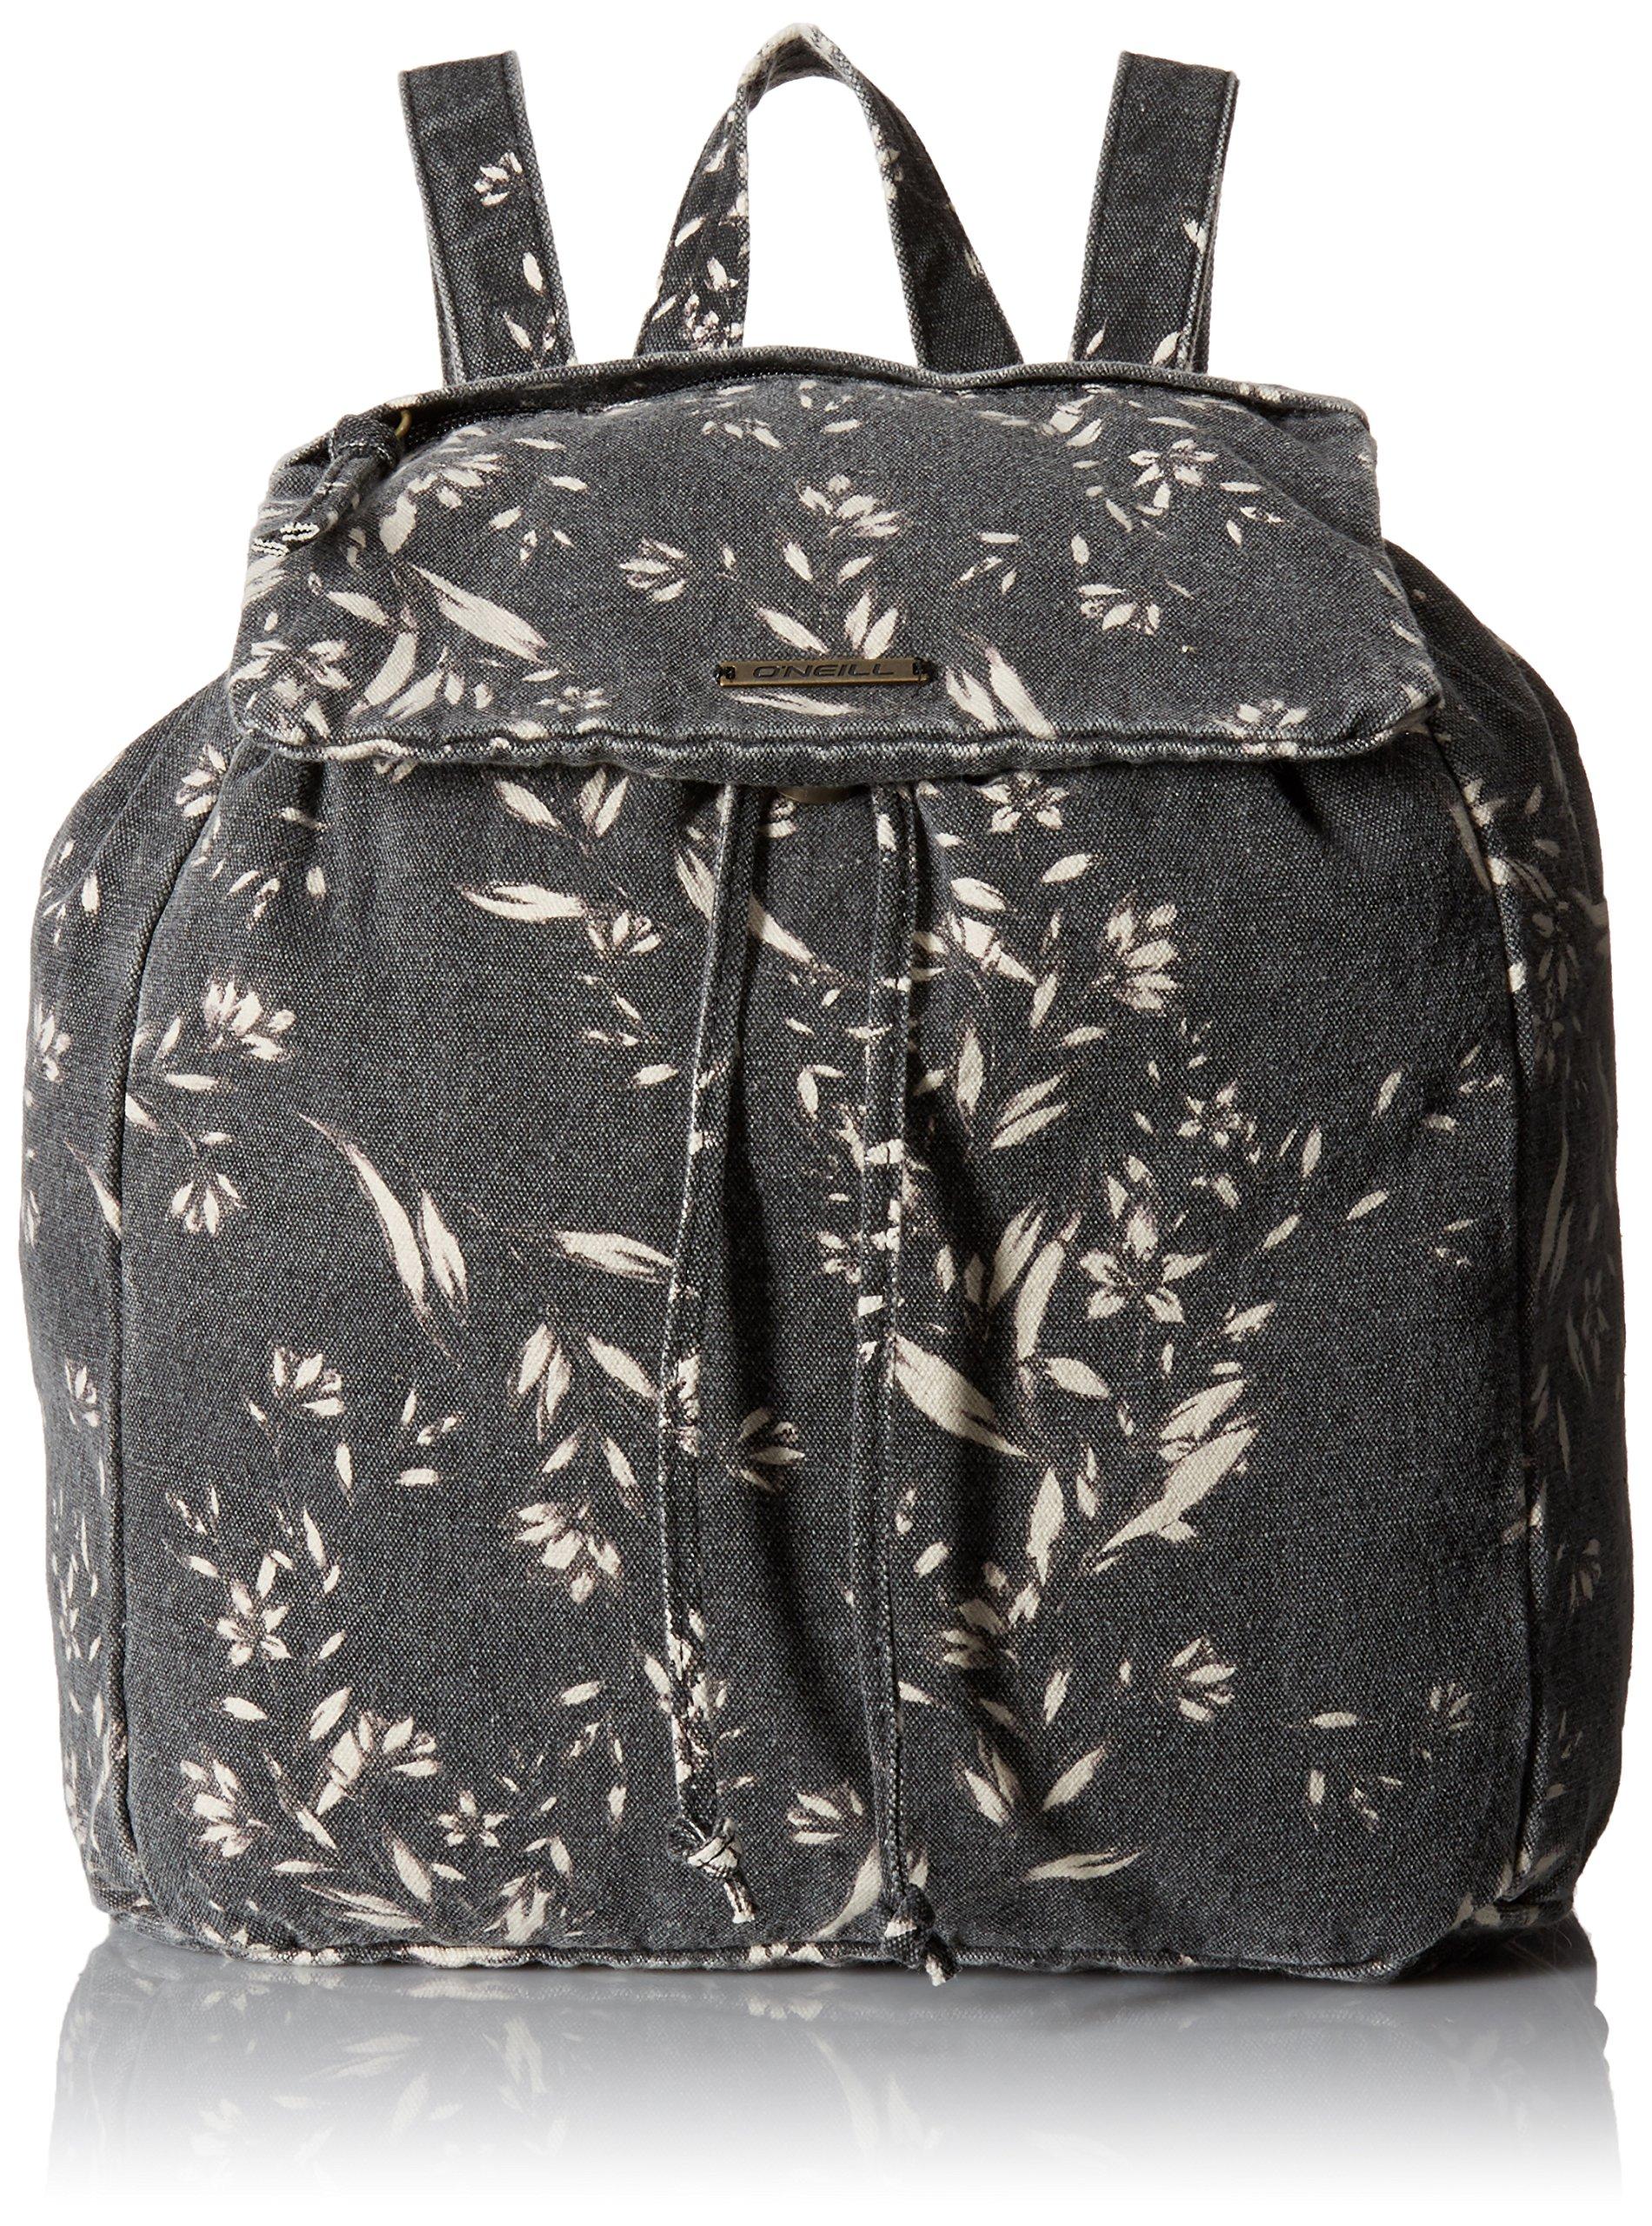 O'Neill Women's Mini Starboard Backpack, Black, ONE